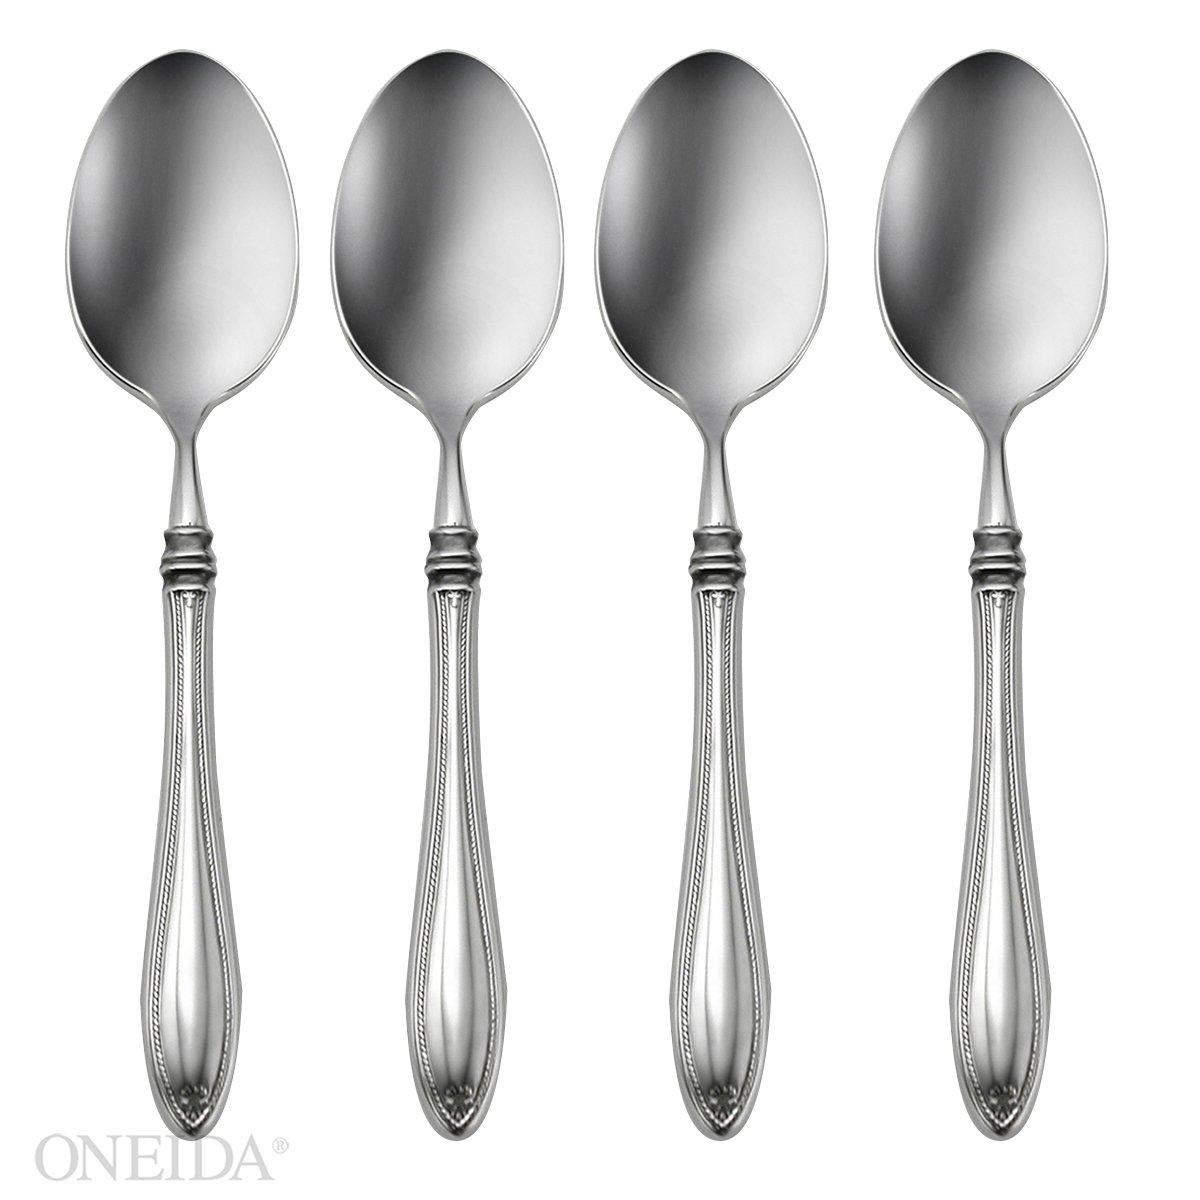 Oneida Sheraton Fine Flatware Set, 18/10 Stainless, Set of 4 Dinner Spoons